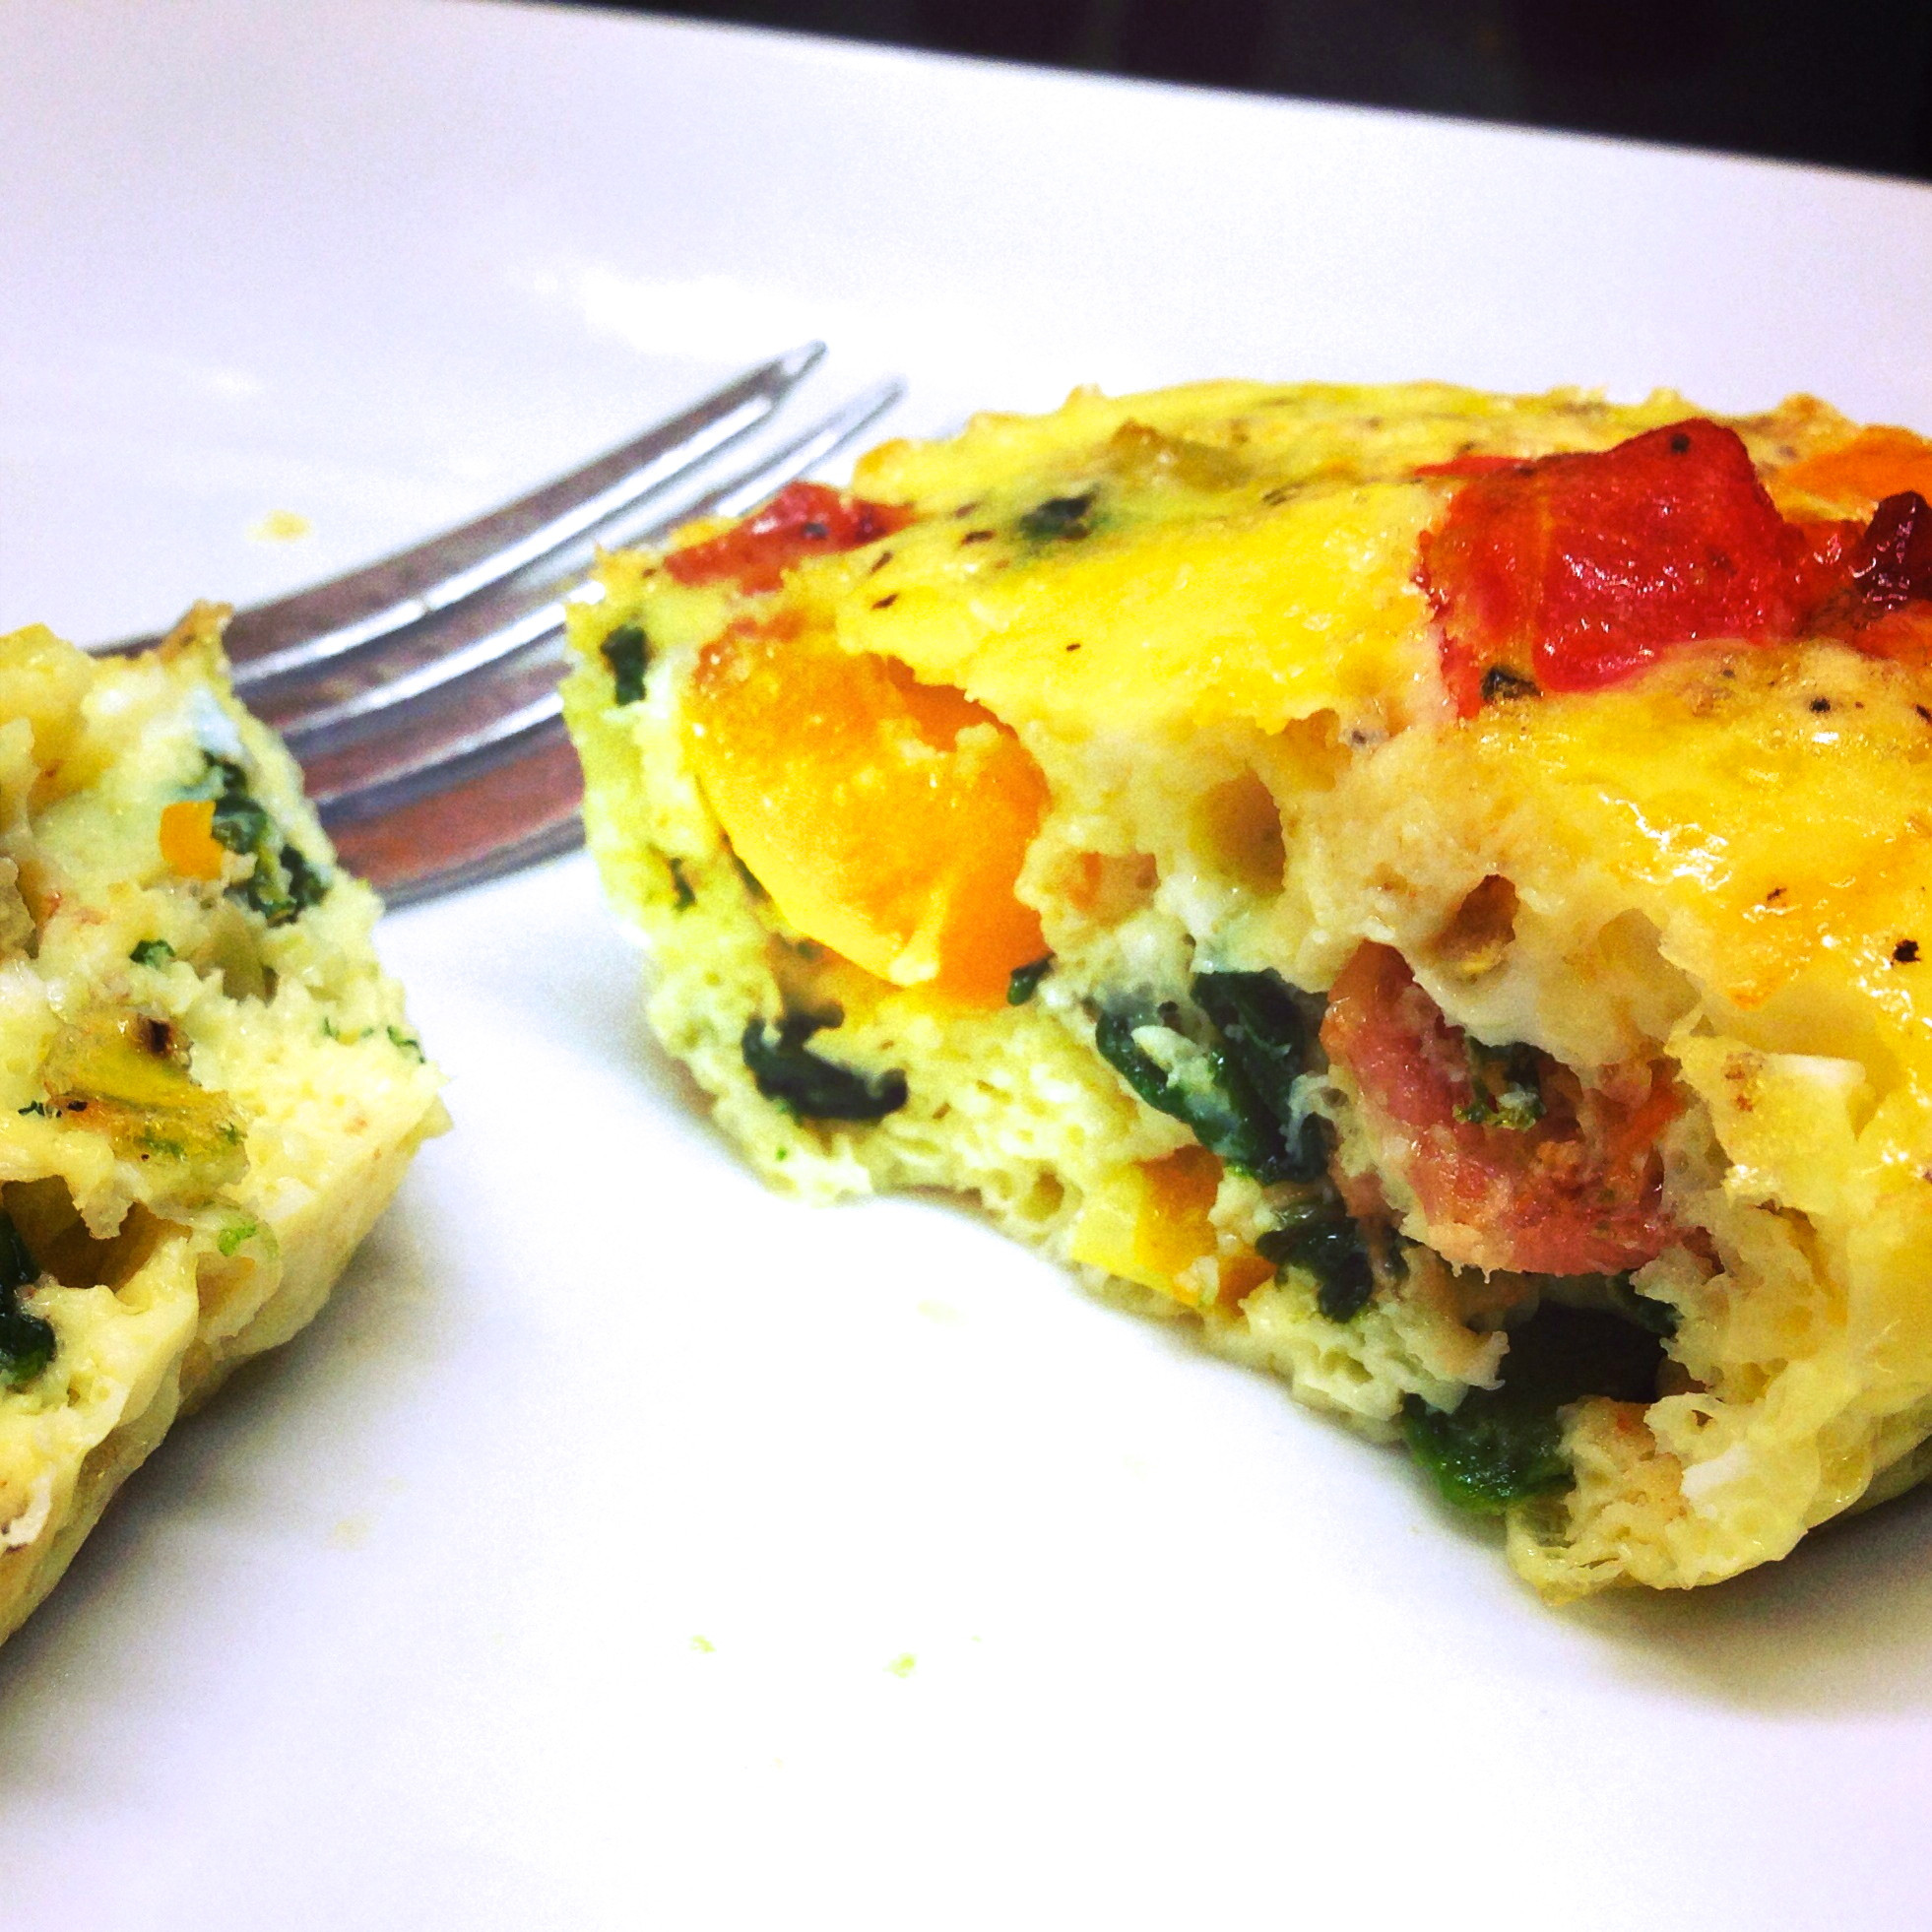 Keto Diet Recipes Breakfast  39 Keto Diet Breakfast Recipes Ketogenic Diet Resource